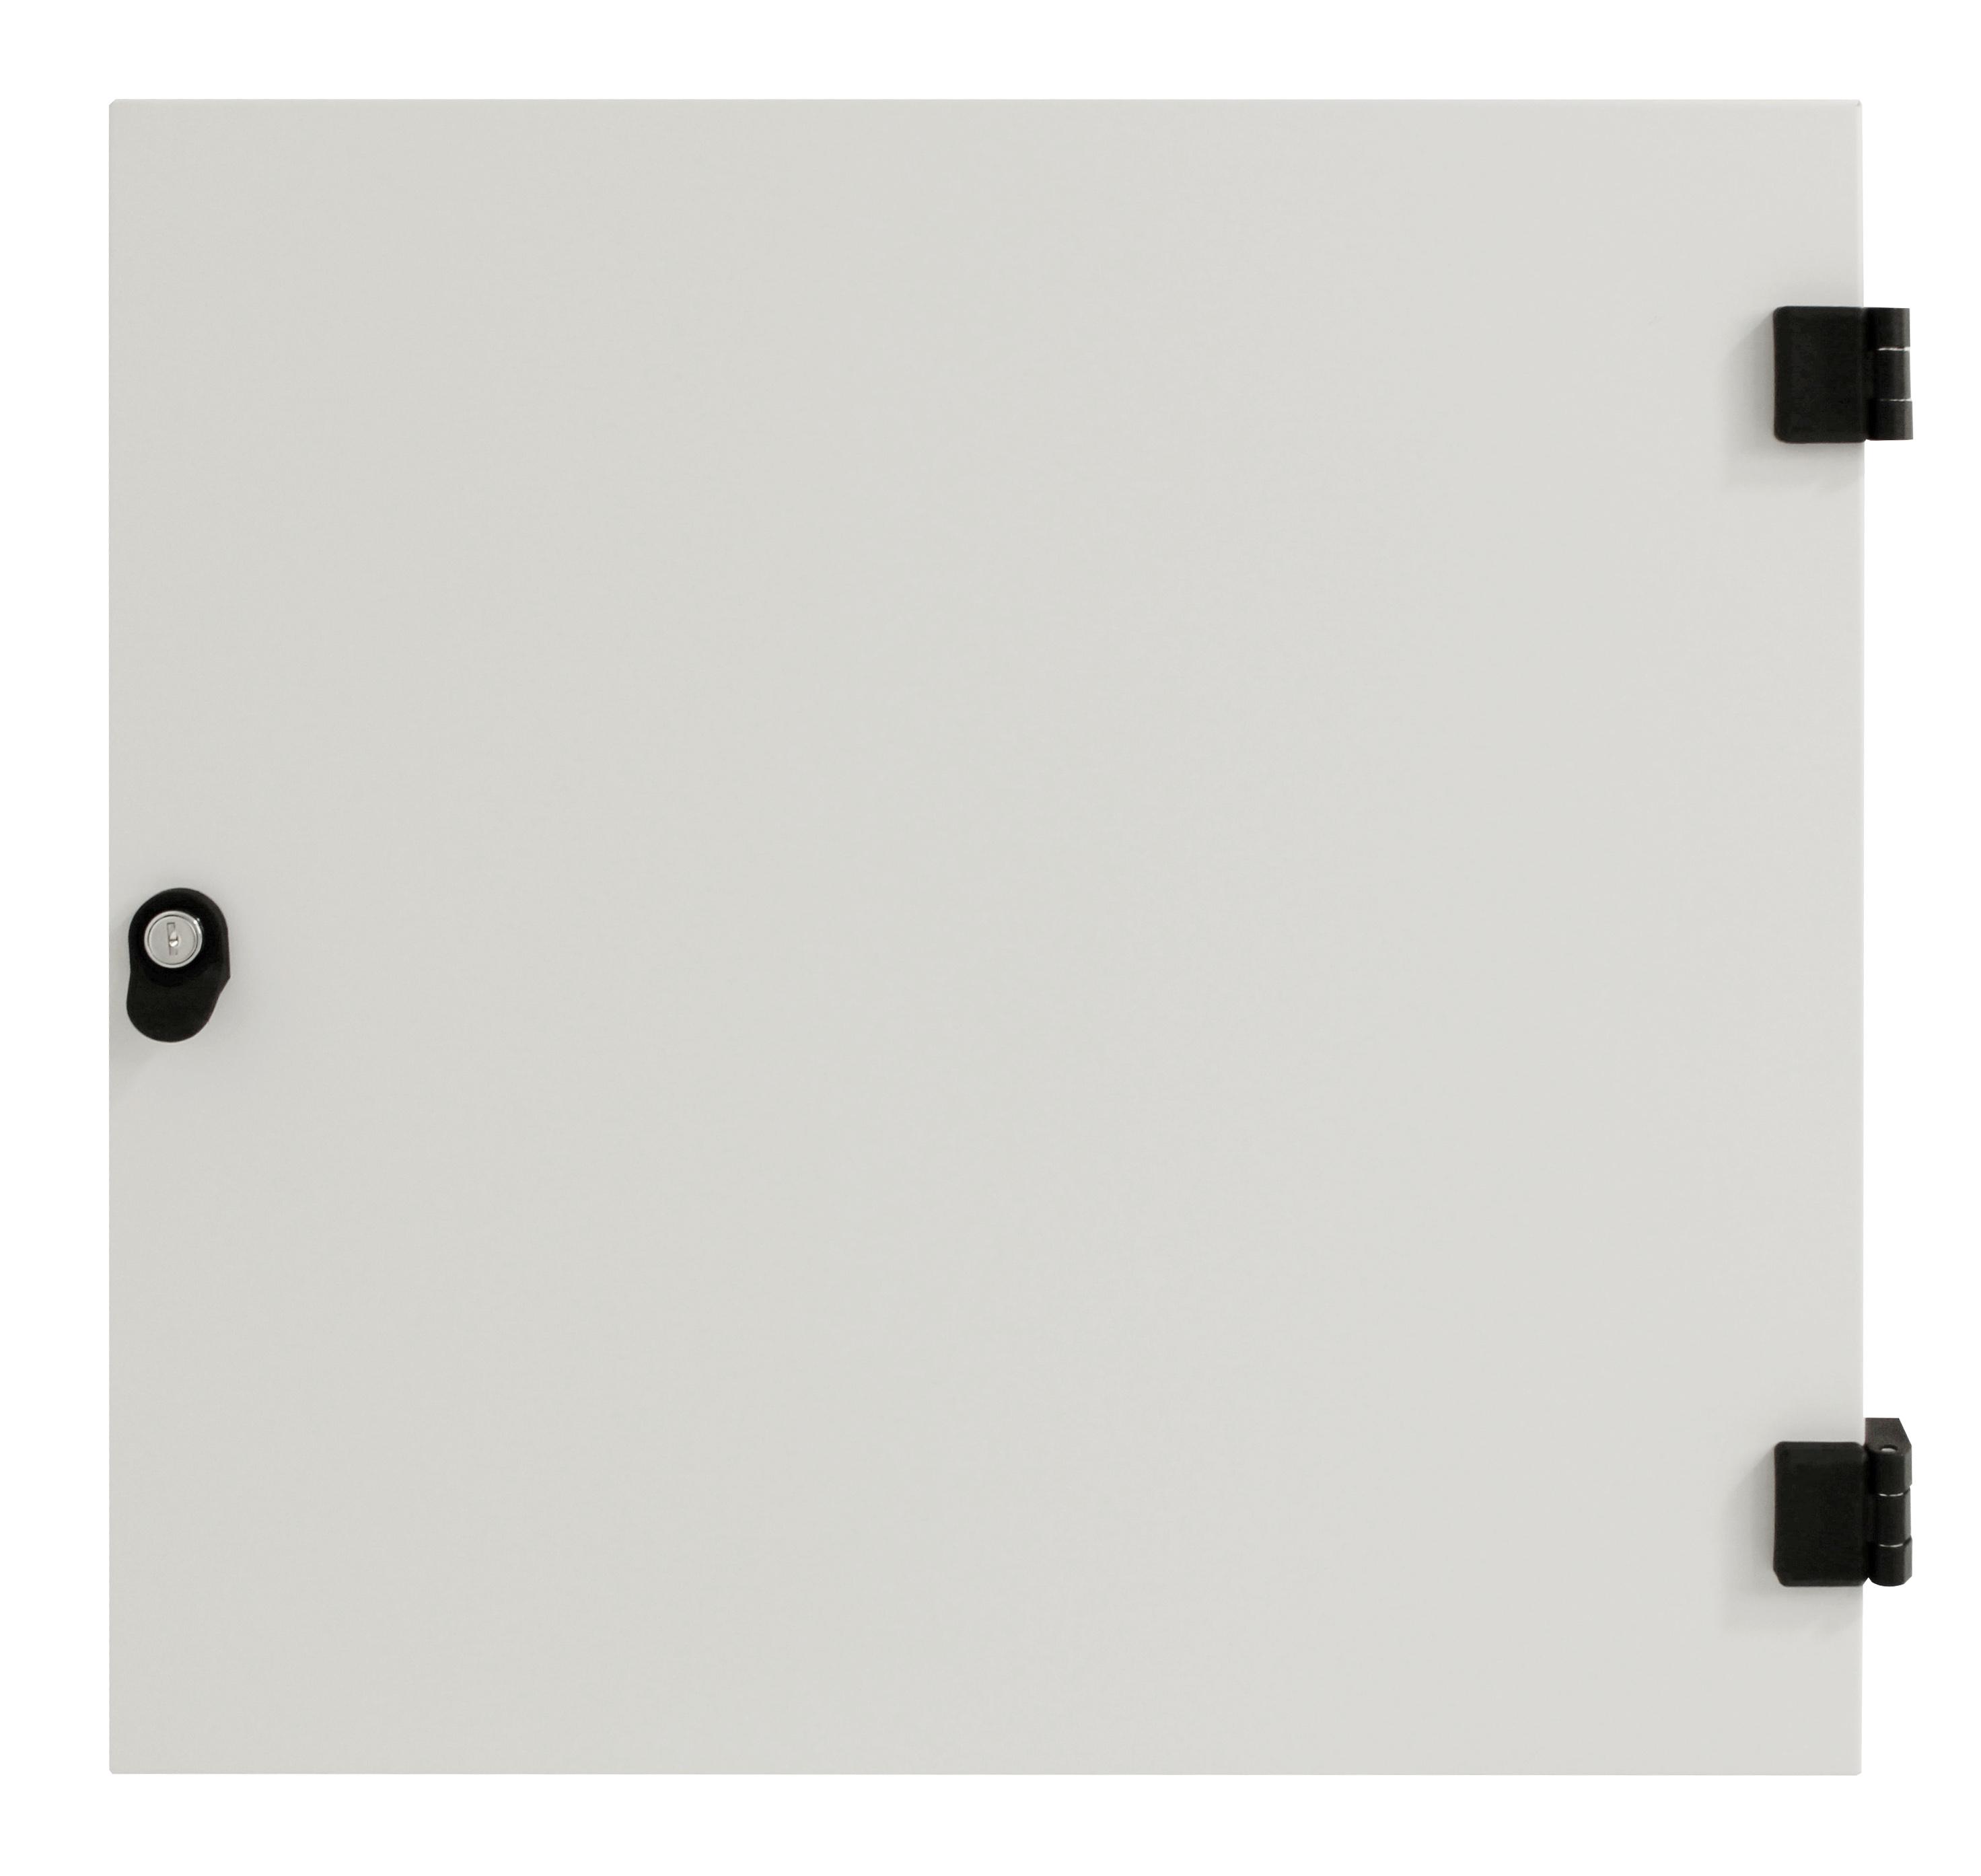 1 Stk Metall-Tür voll für DW-Schrank 15HE, B=600, RAL7035 DWRT1560--